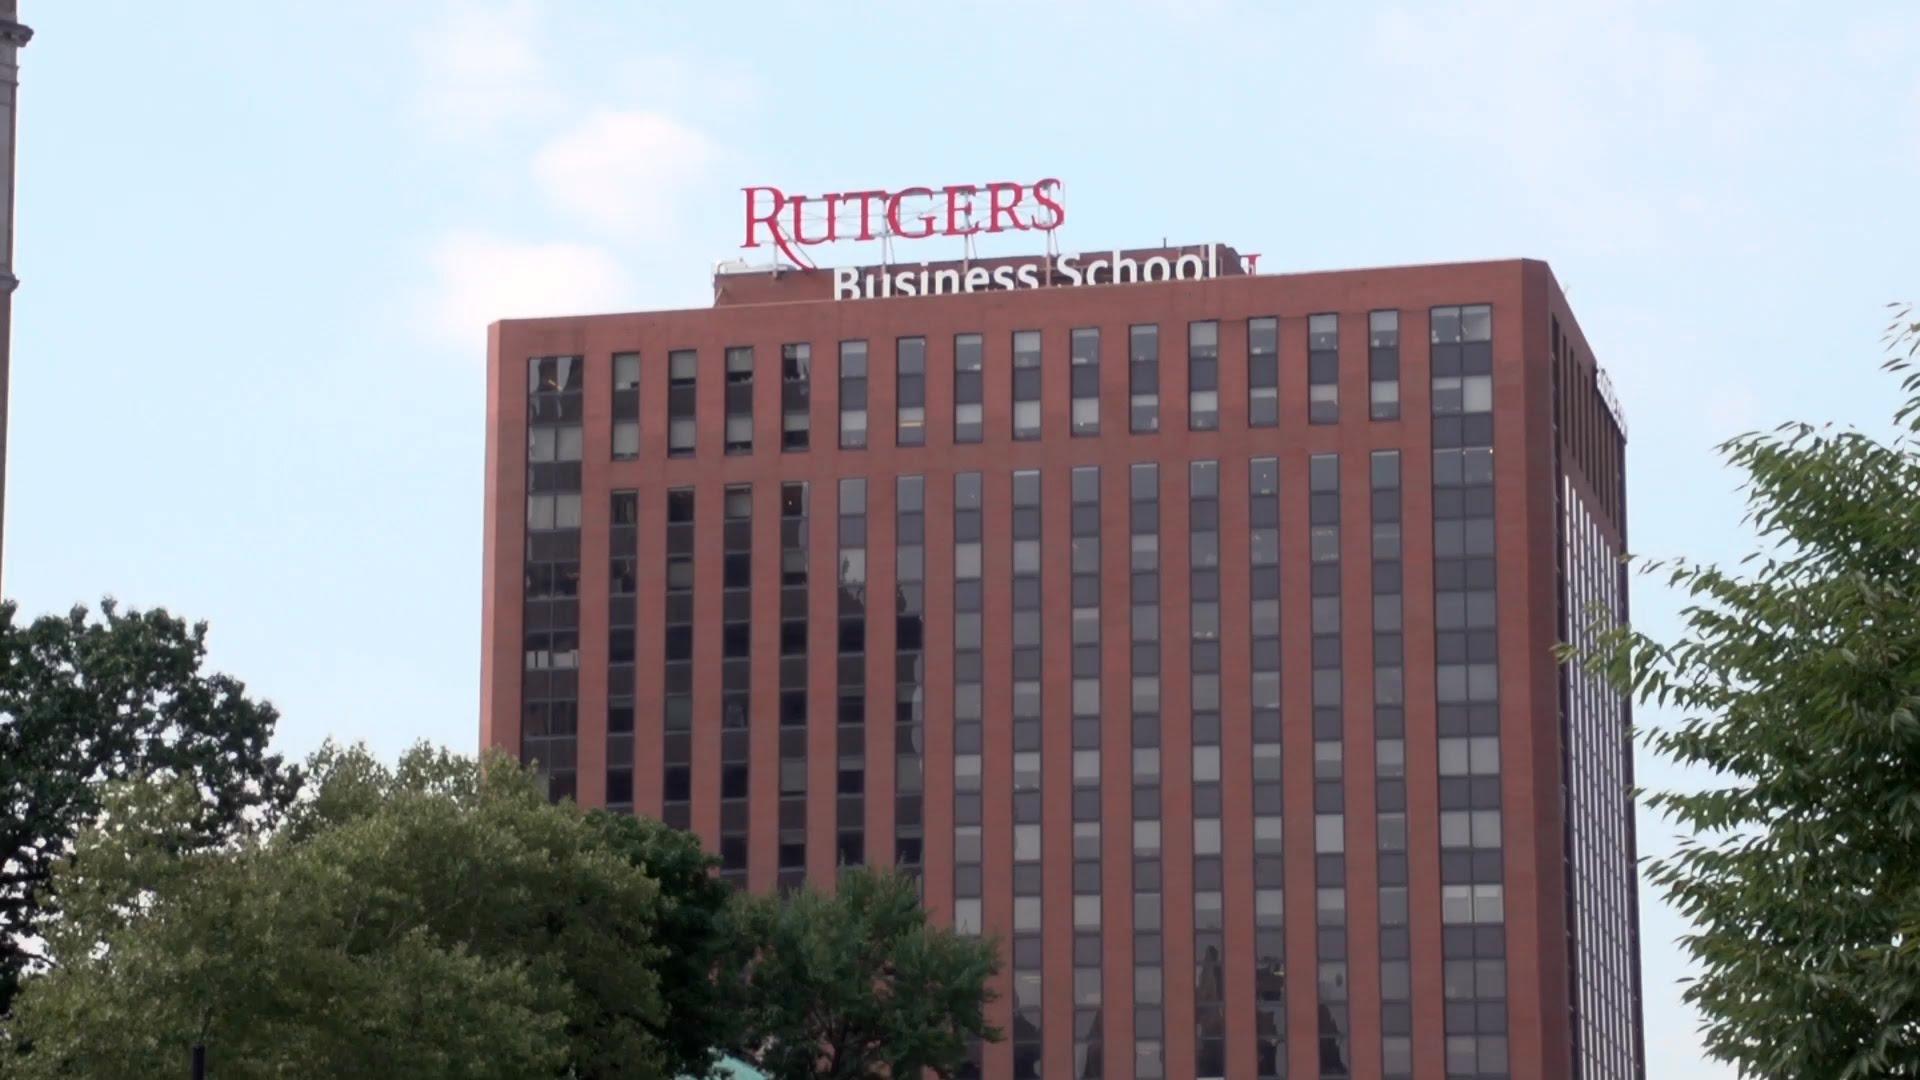 Rutgers Business School  - Newark, New Jersey (photo via  Rutgers )